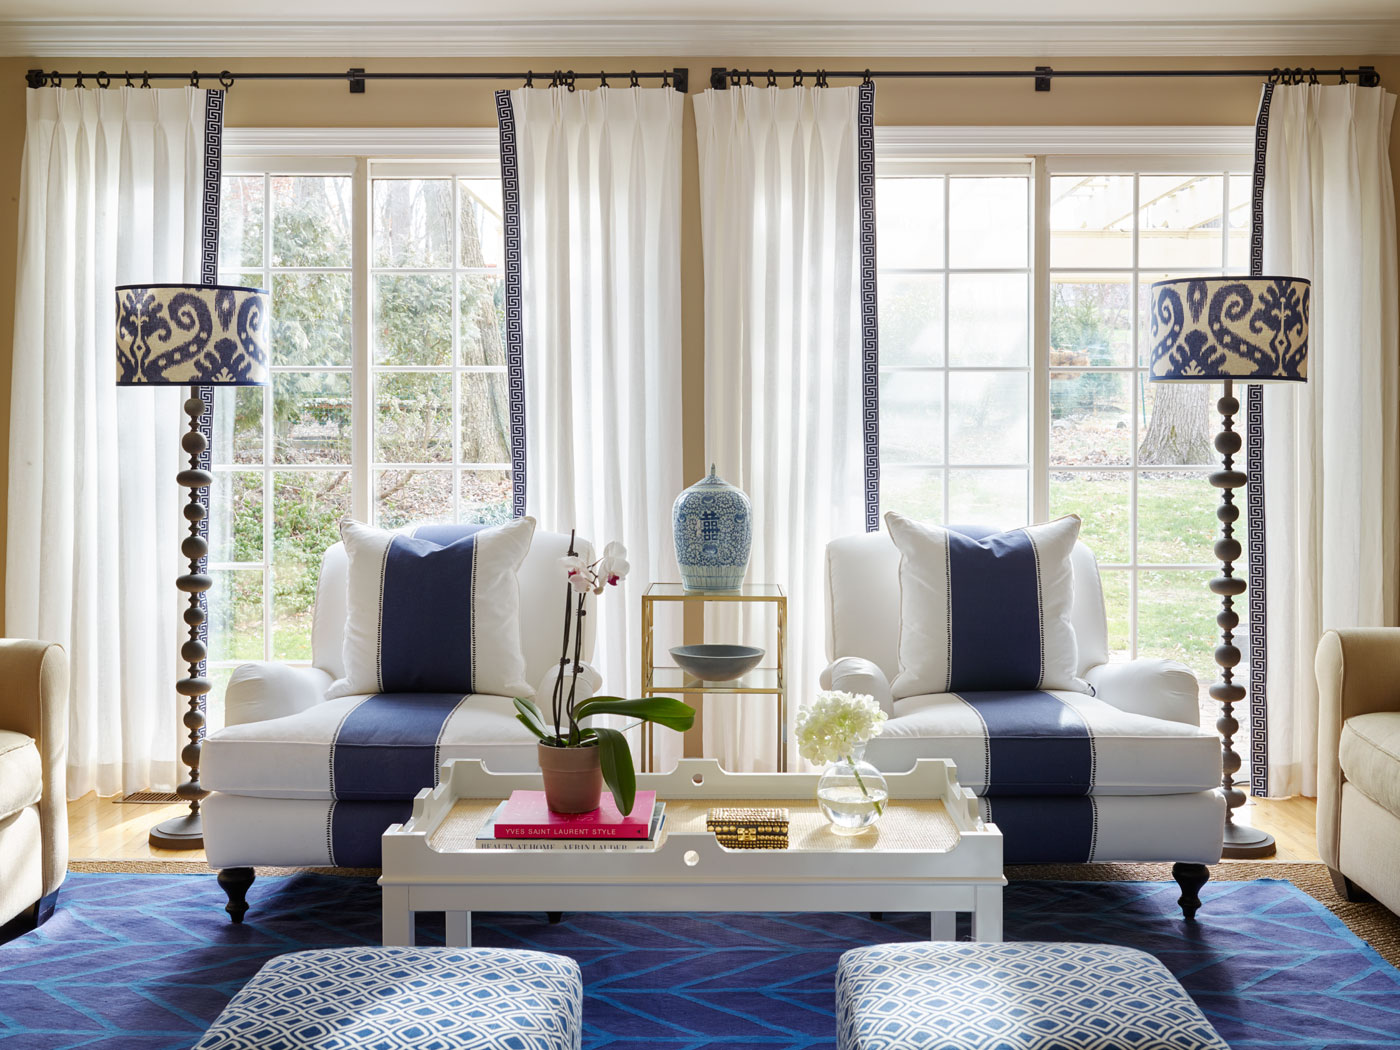 Stephanie Kraus Designs: Blue and White Living Room